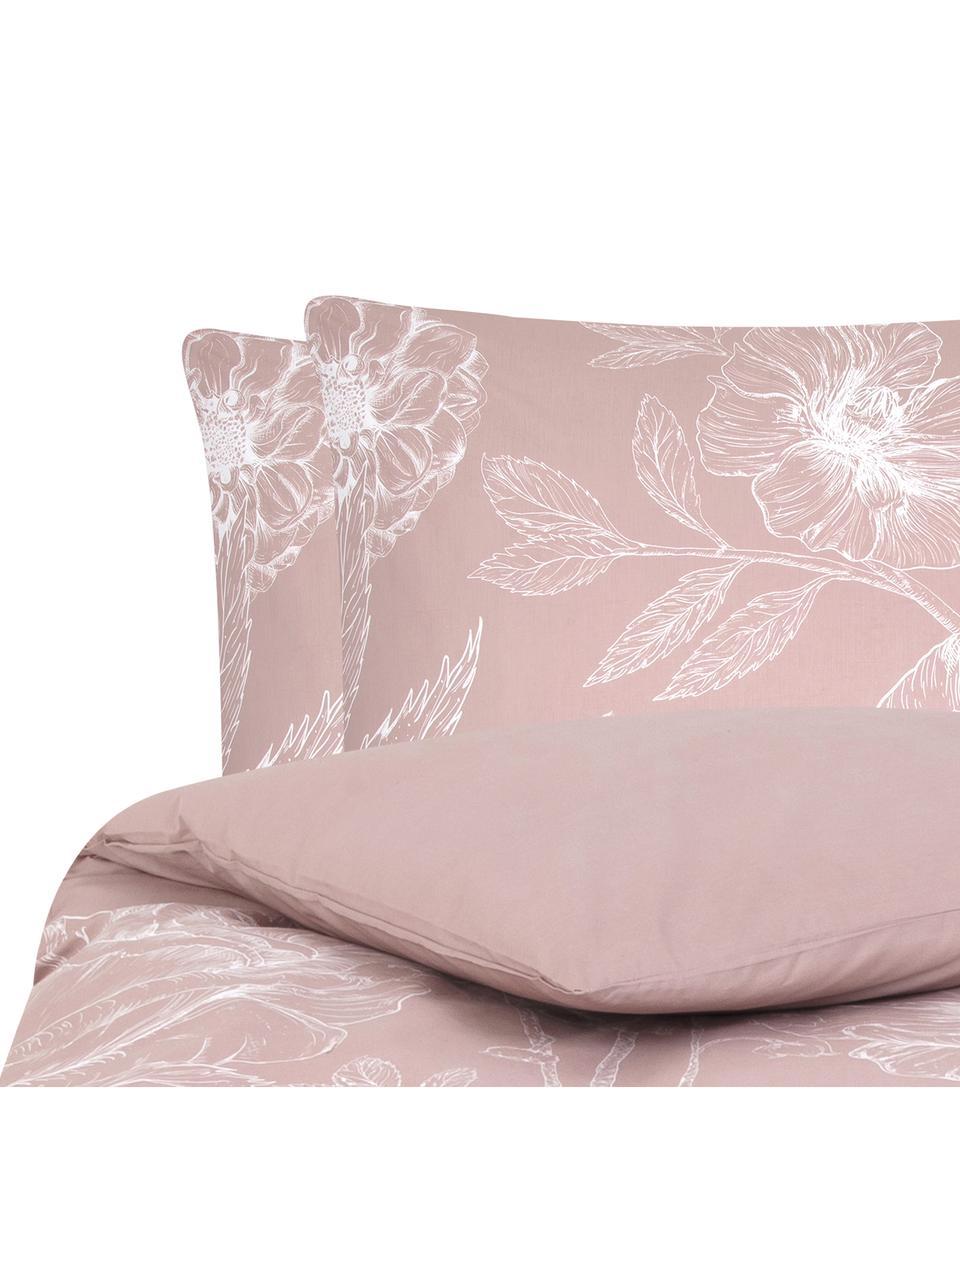 Baumwollperkal-Bettwäsche Keno mit Blumenprint, Webart: Perkal Fadendichte 180 TC, Altrosa, Weiß, 240 x 220 cm + 2 Kissen 80 x 80 cm